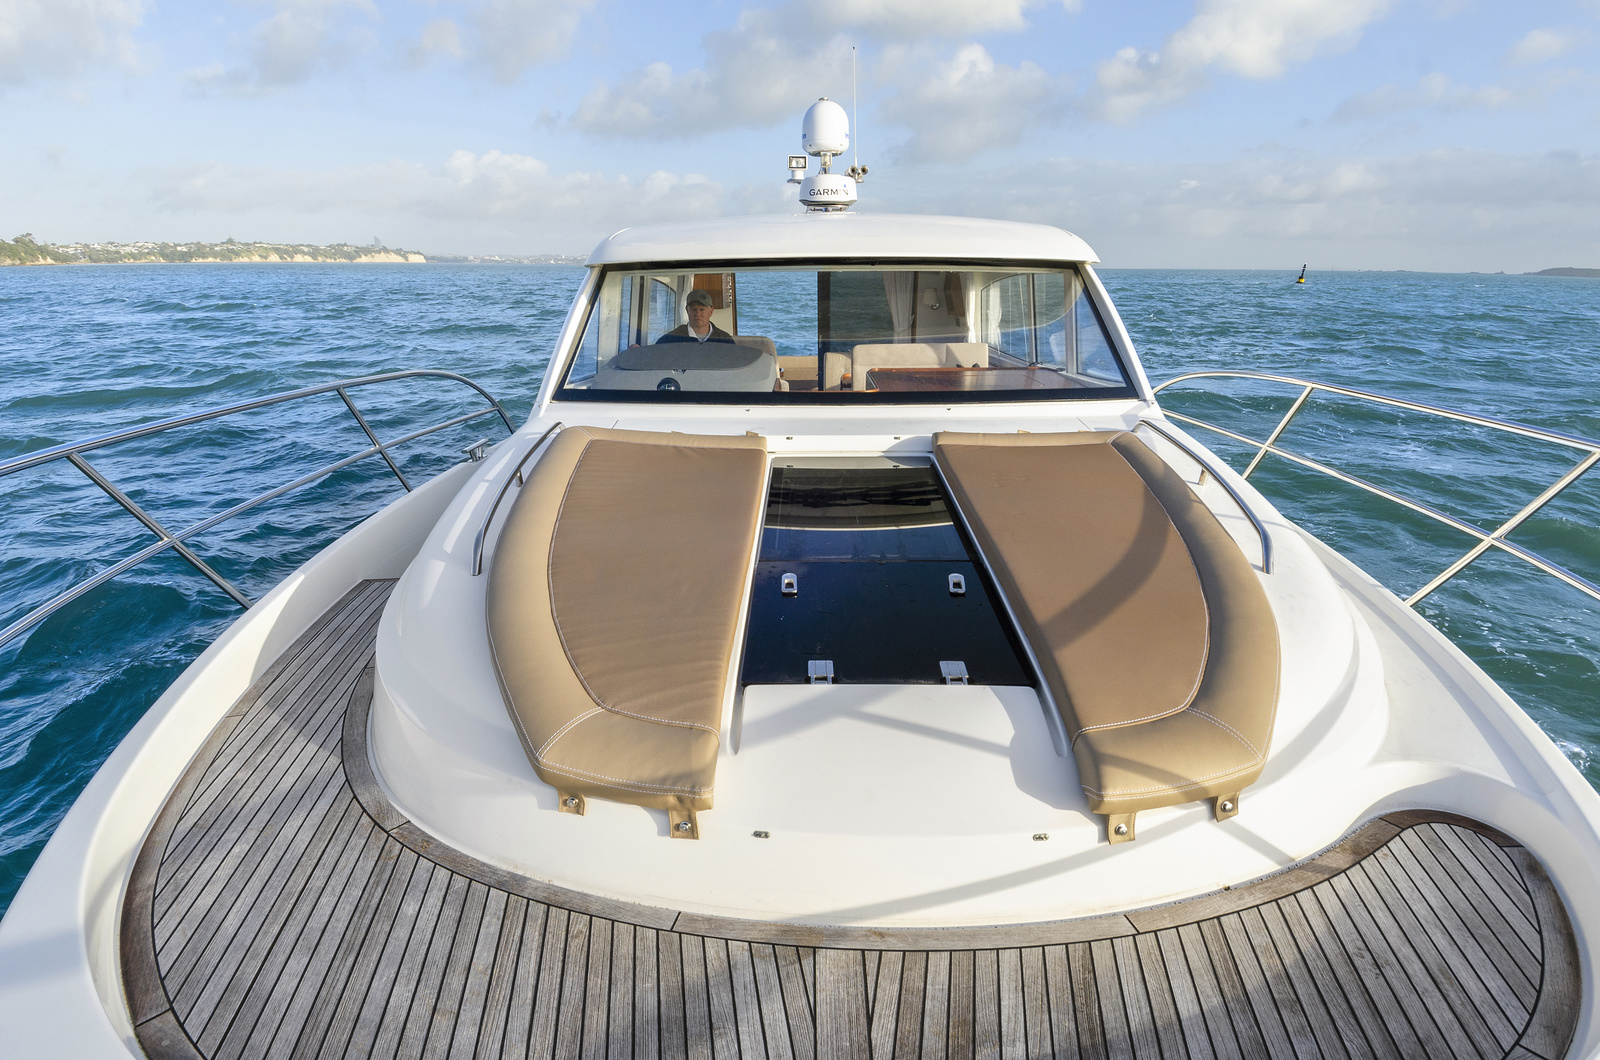 2018 Nimbus 405 Coupe - $100k price reduction!